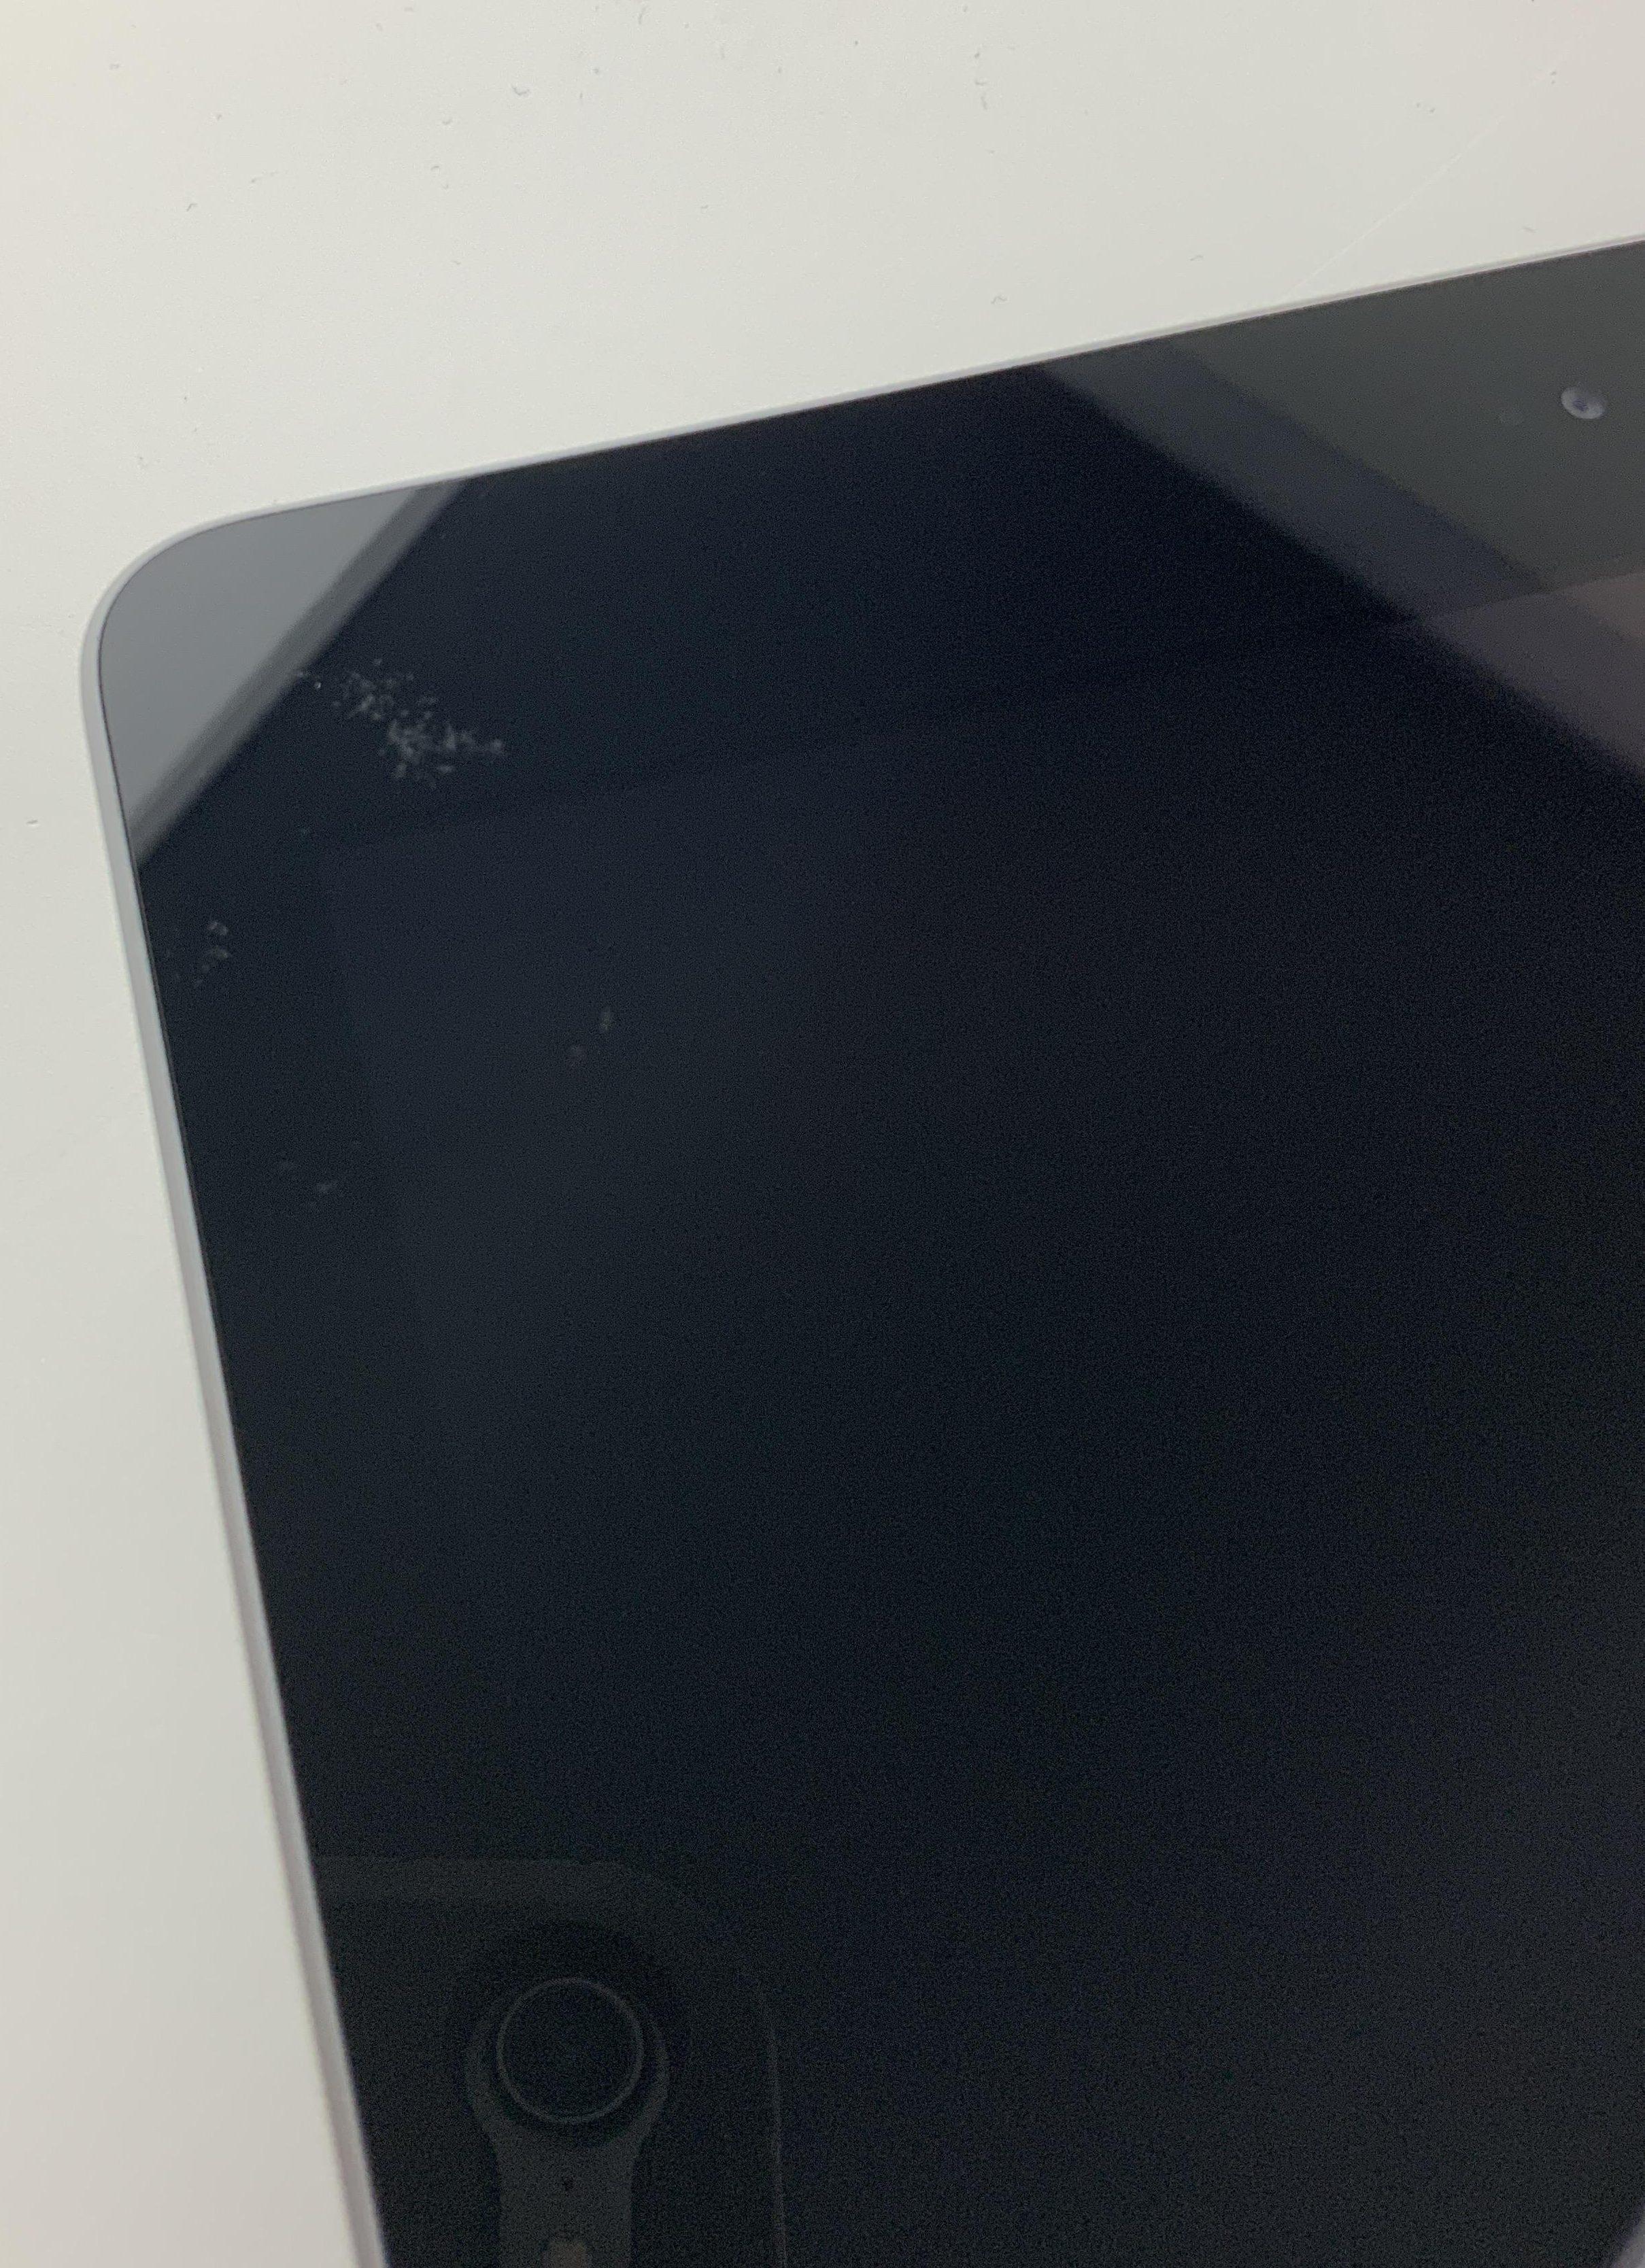 iPad 6 Wi-Fi 32GB, 32GB, Space Gray, bild 4